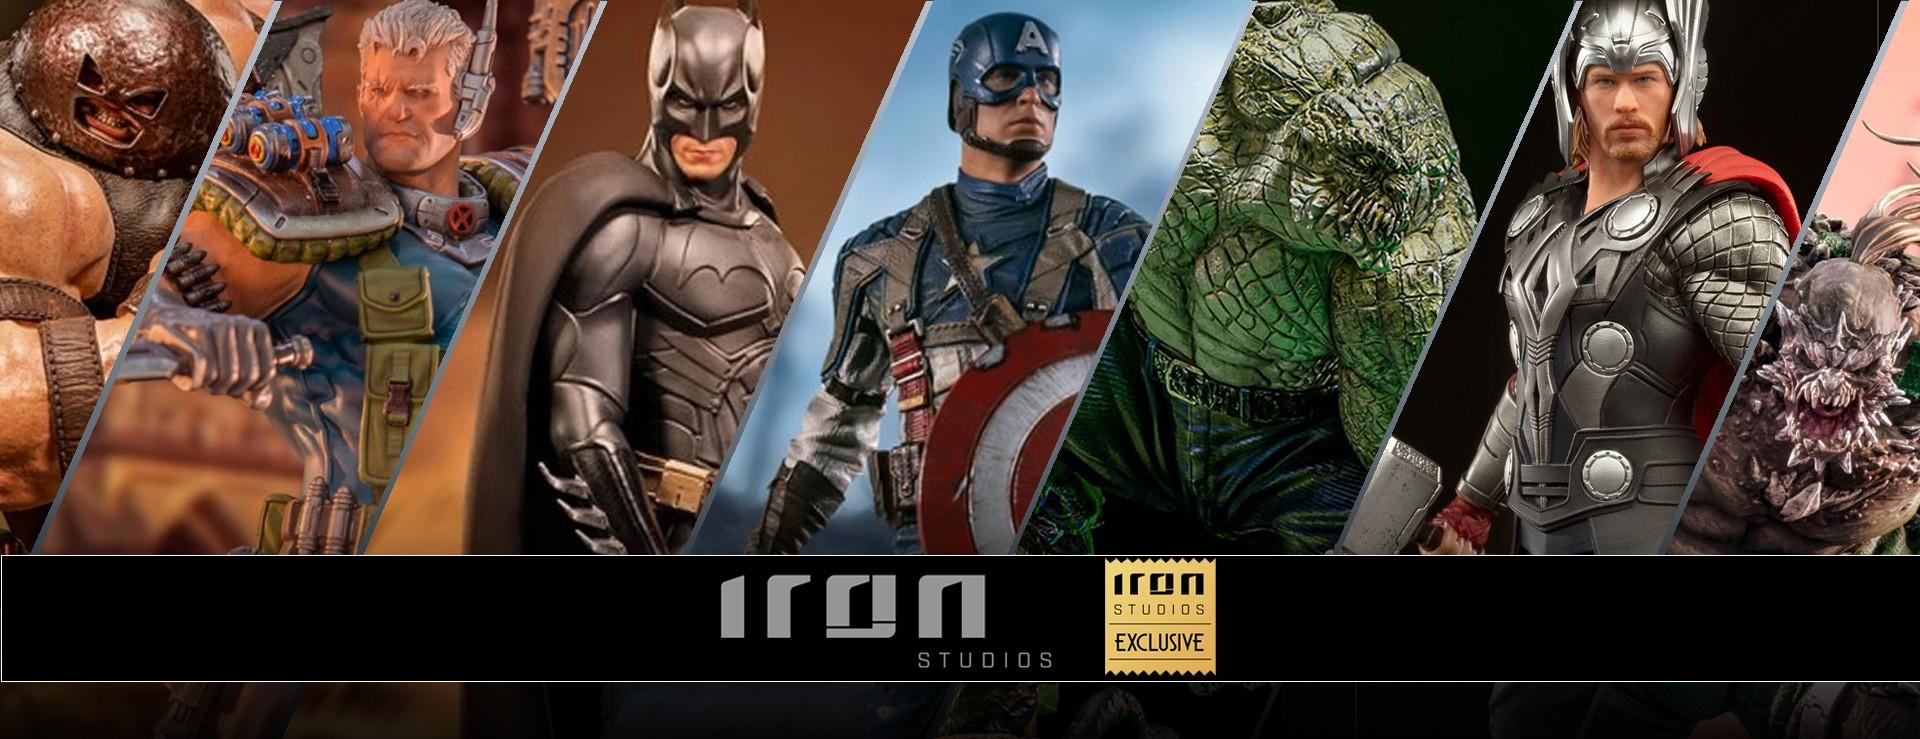 iron studios exclusives